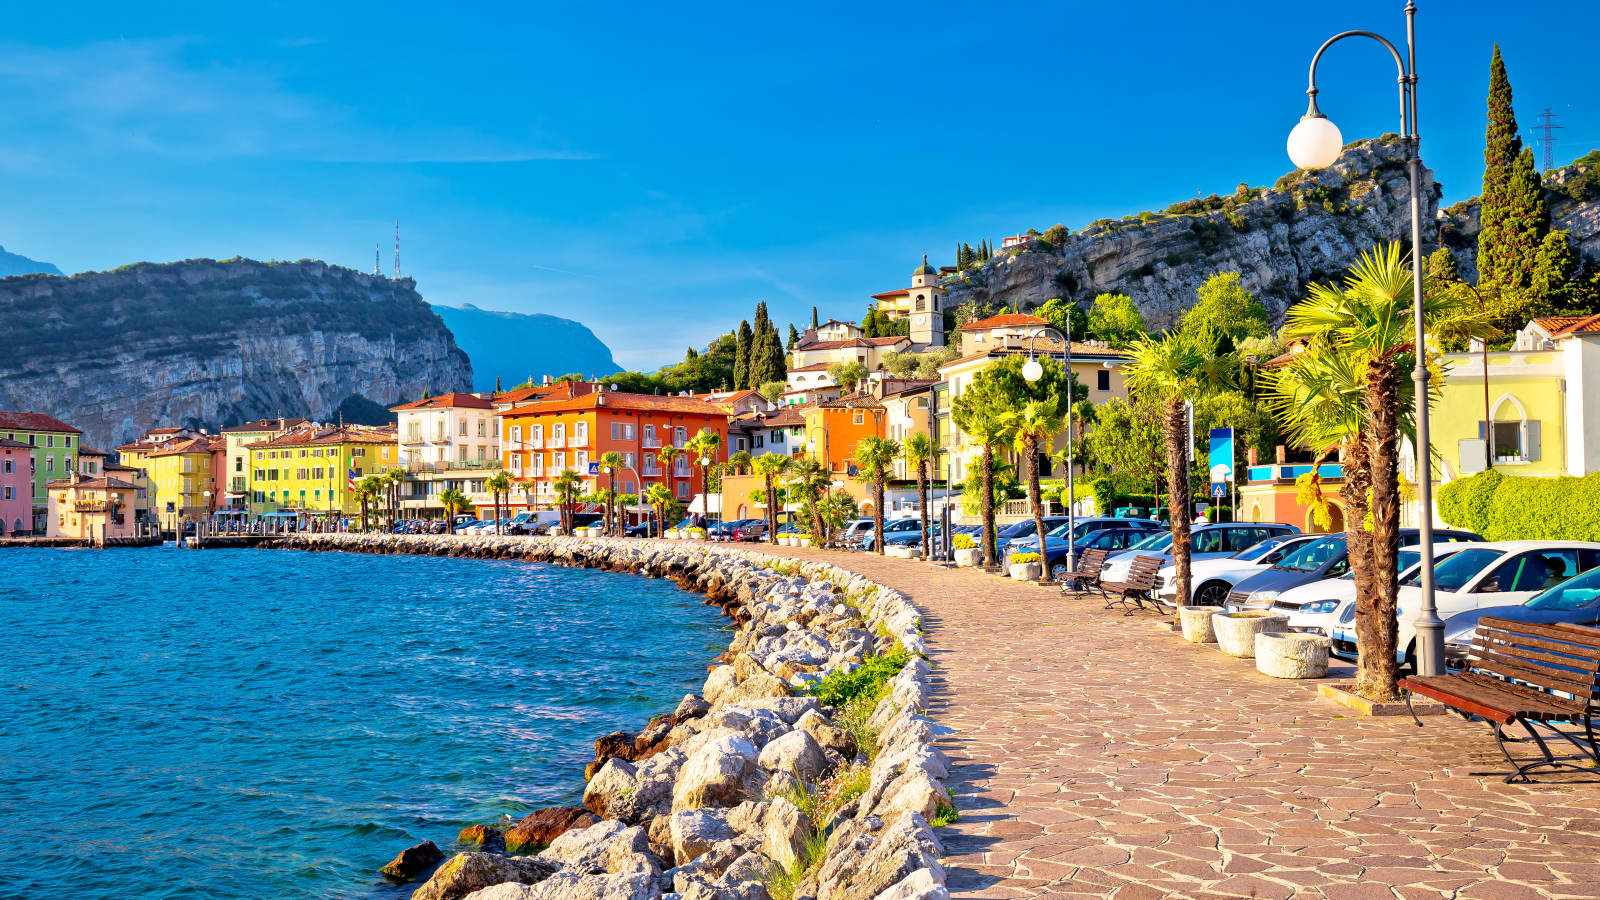 Holidays To Torbole Lake Garda Topflight Ireland S